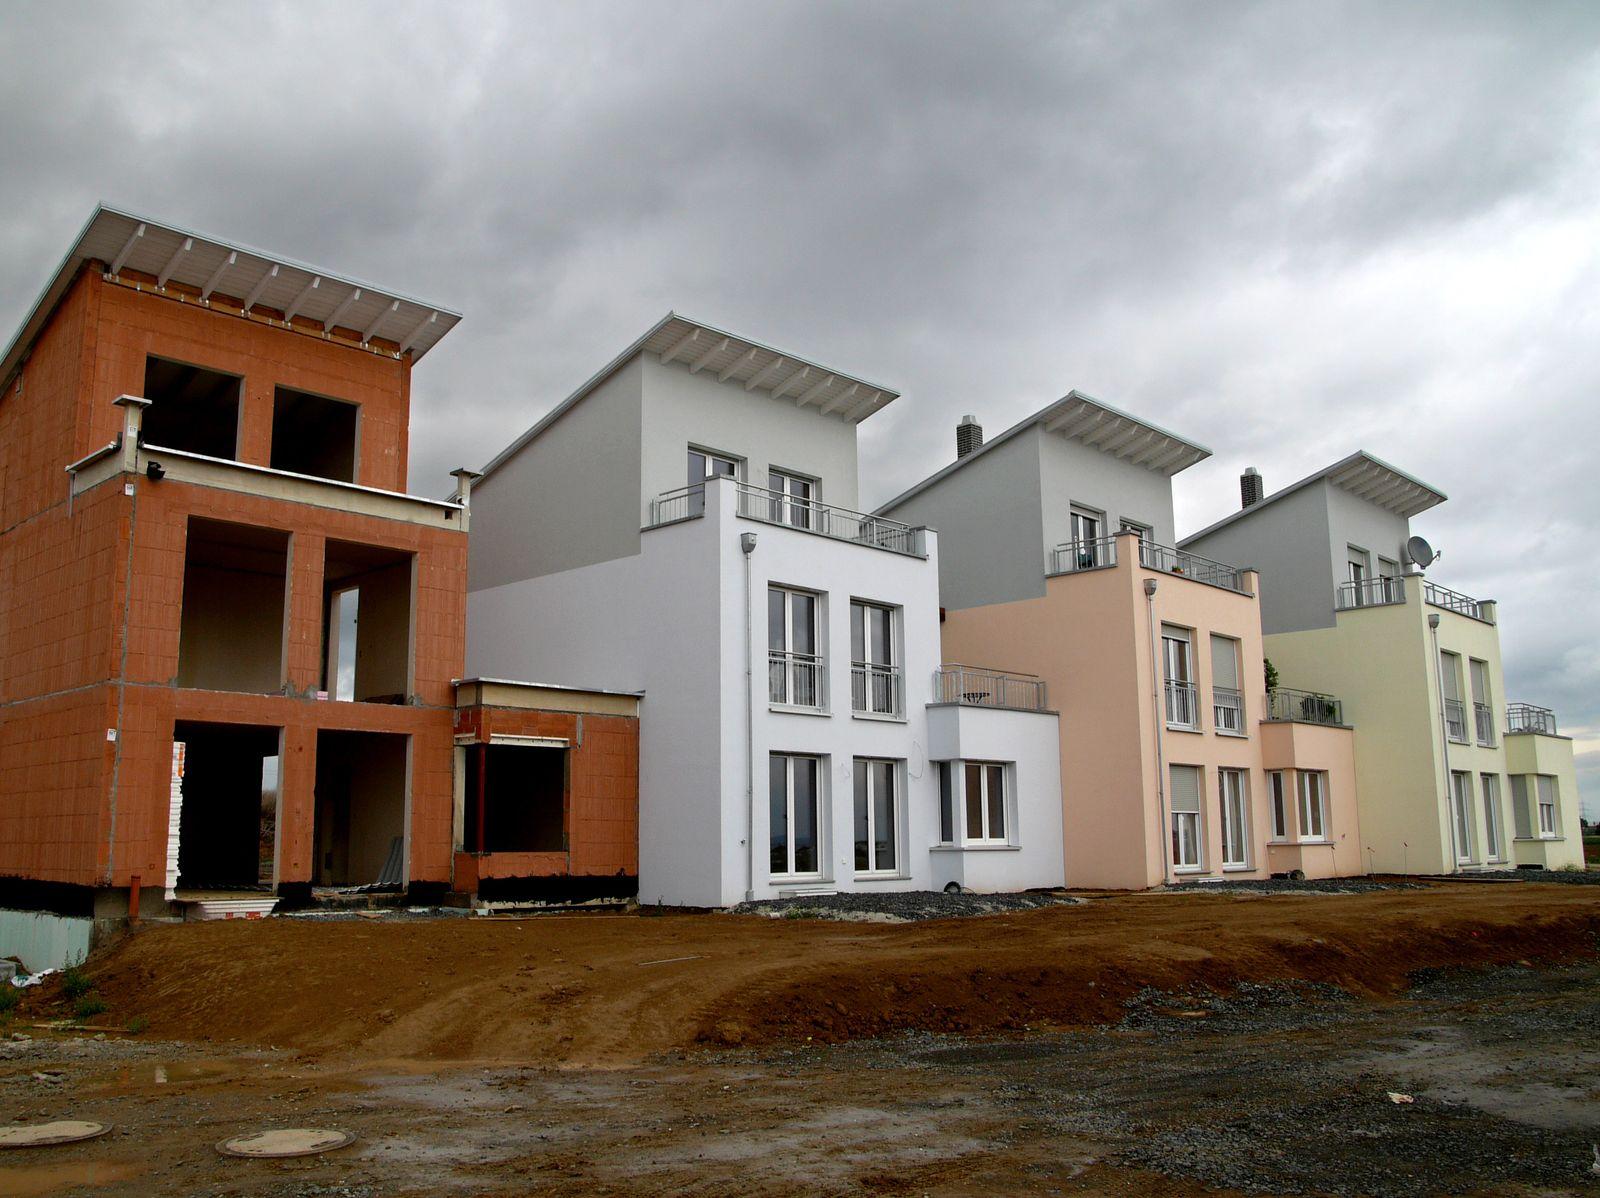 Besitz / Haus / Eigenheim